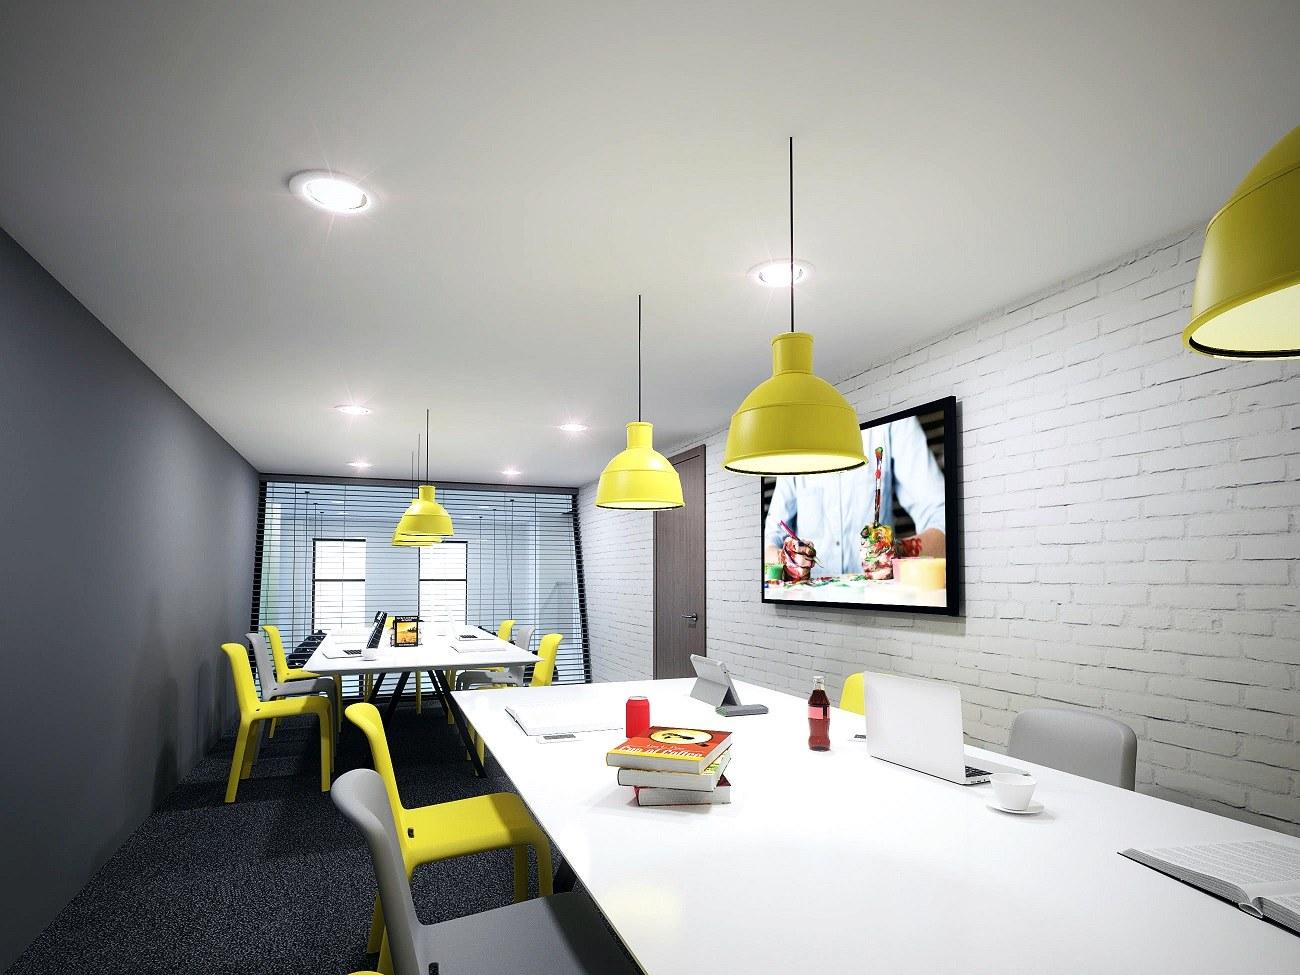 Glendower-House-Cardiff-Study-Room-Unilodgers